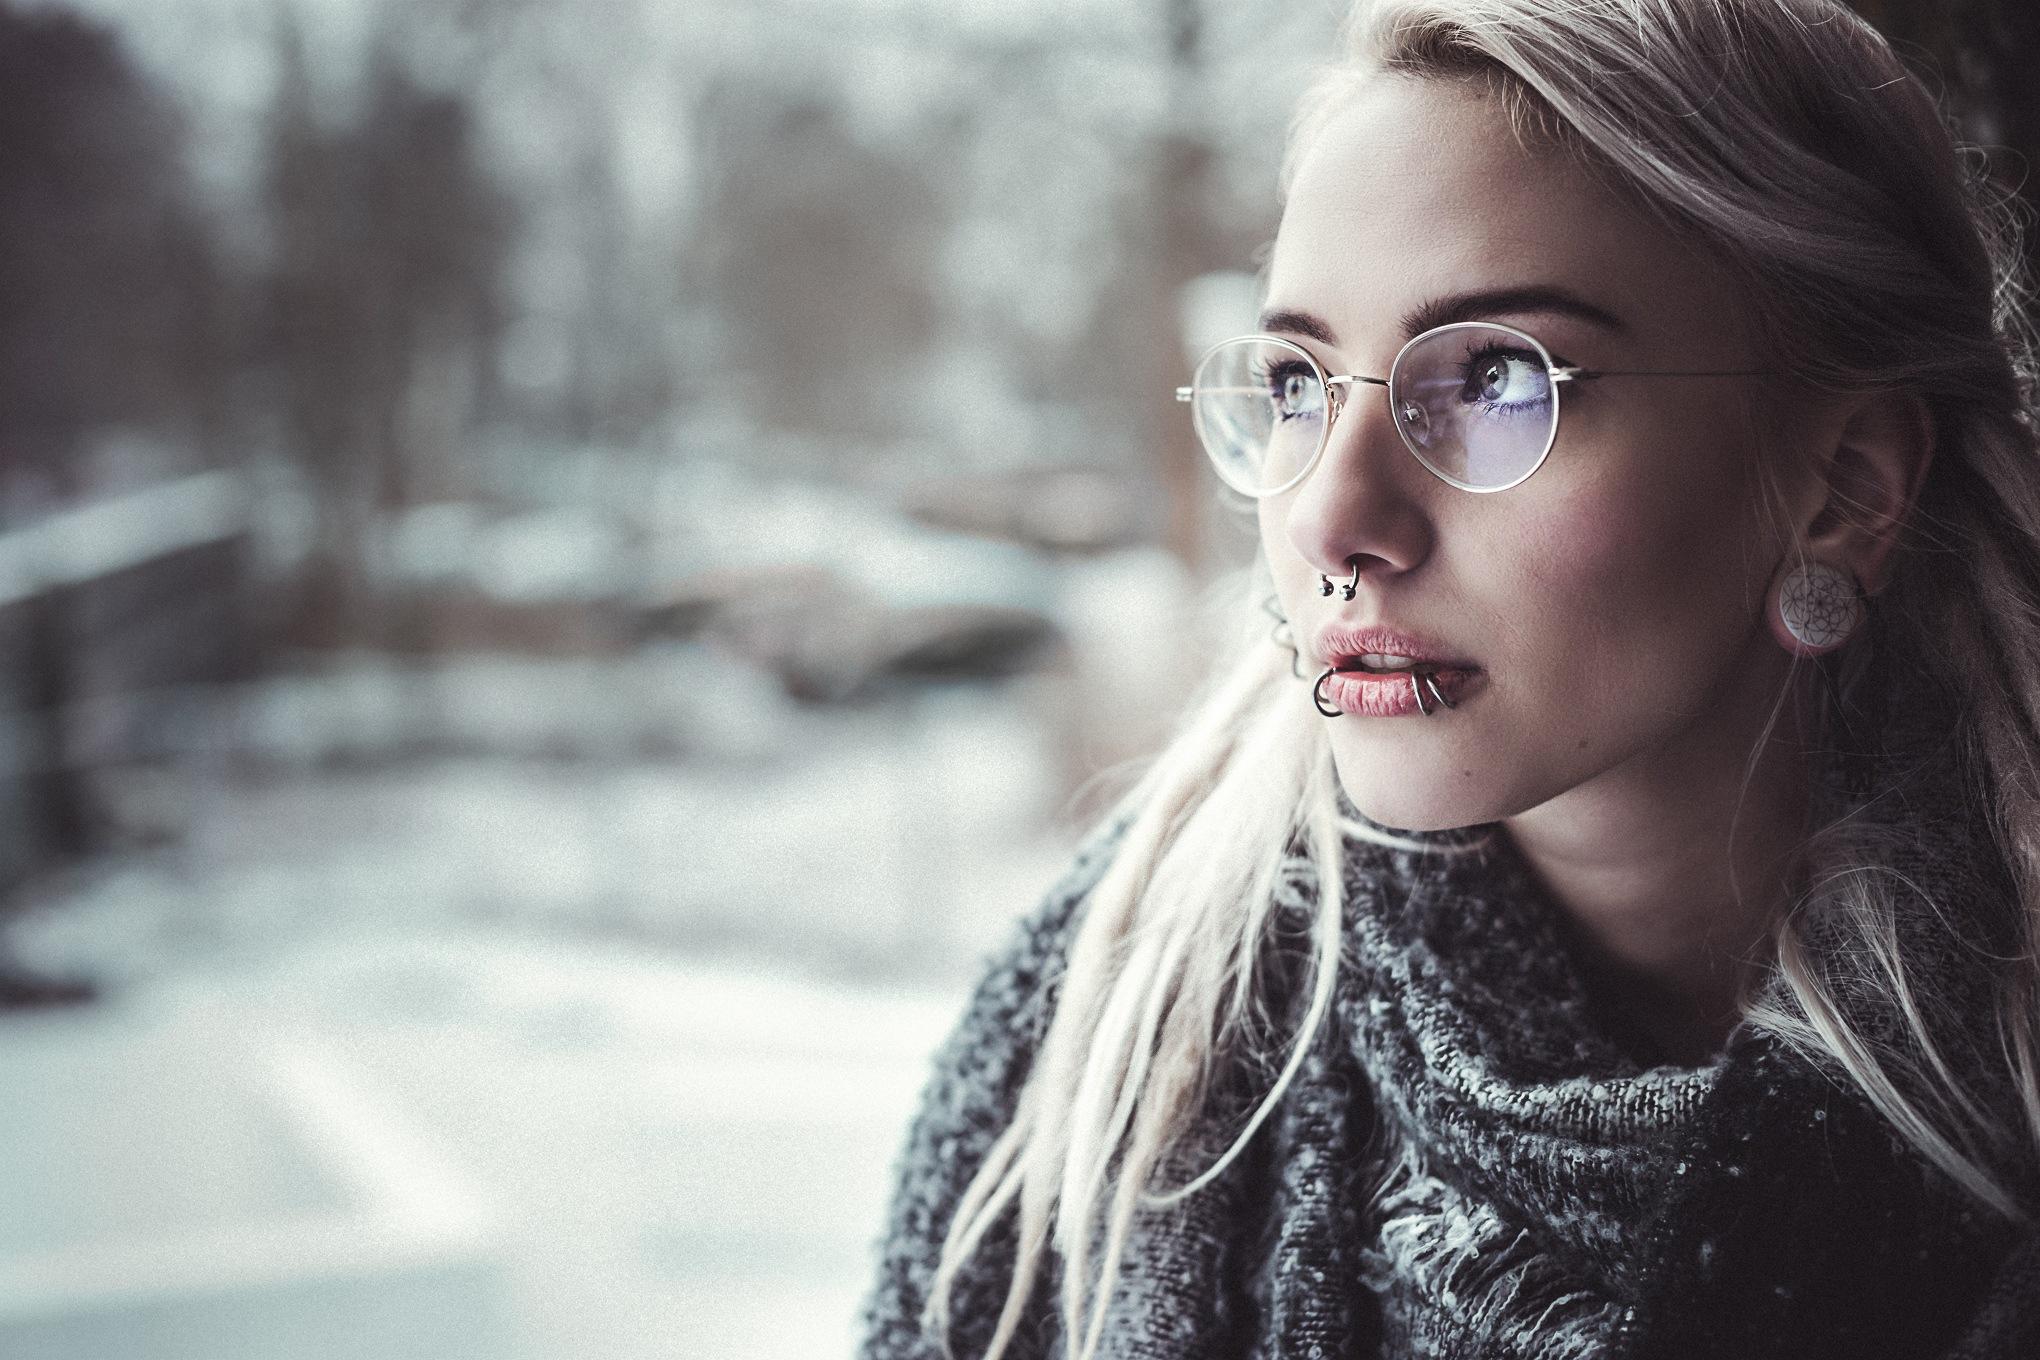 Winter dreaming by Andy Winterholer